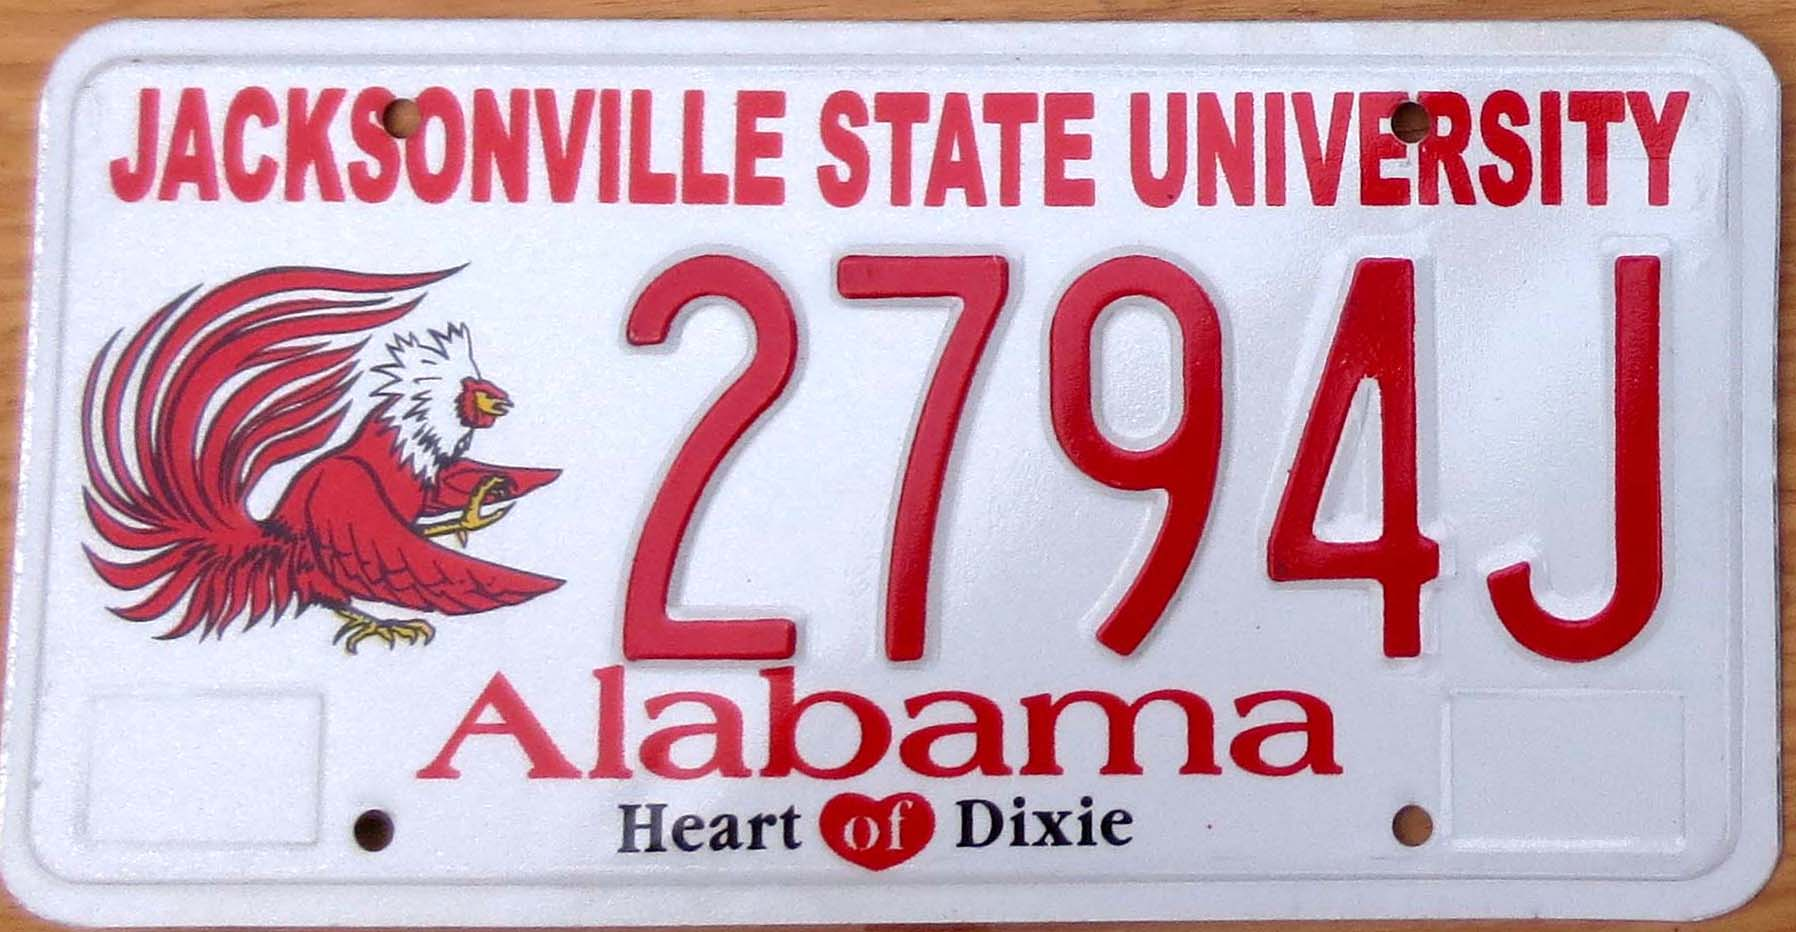 Jacksonville State University Photo License Plate